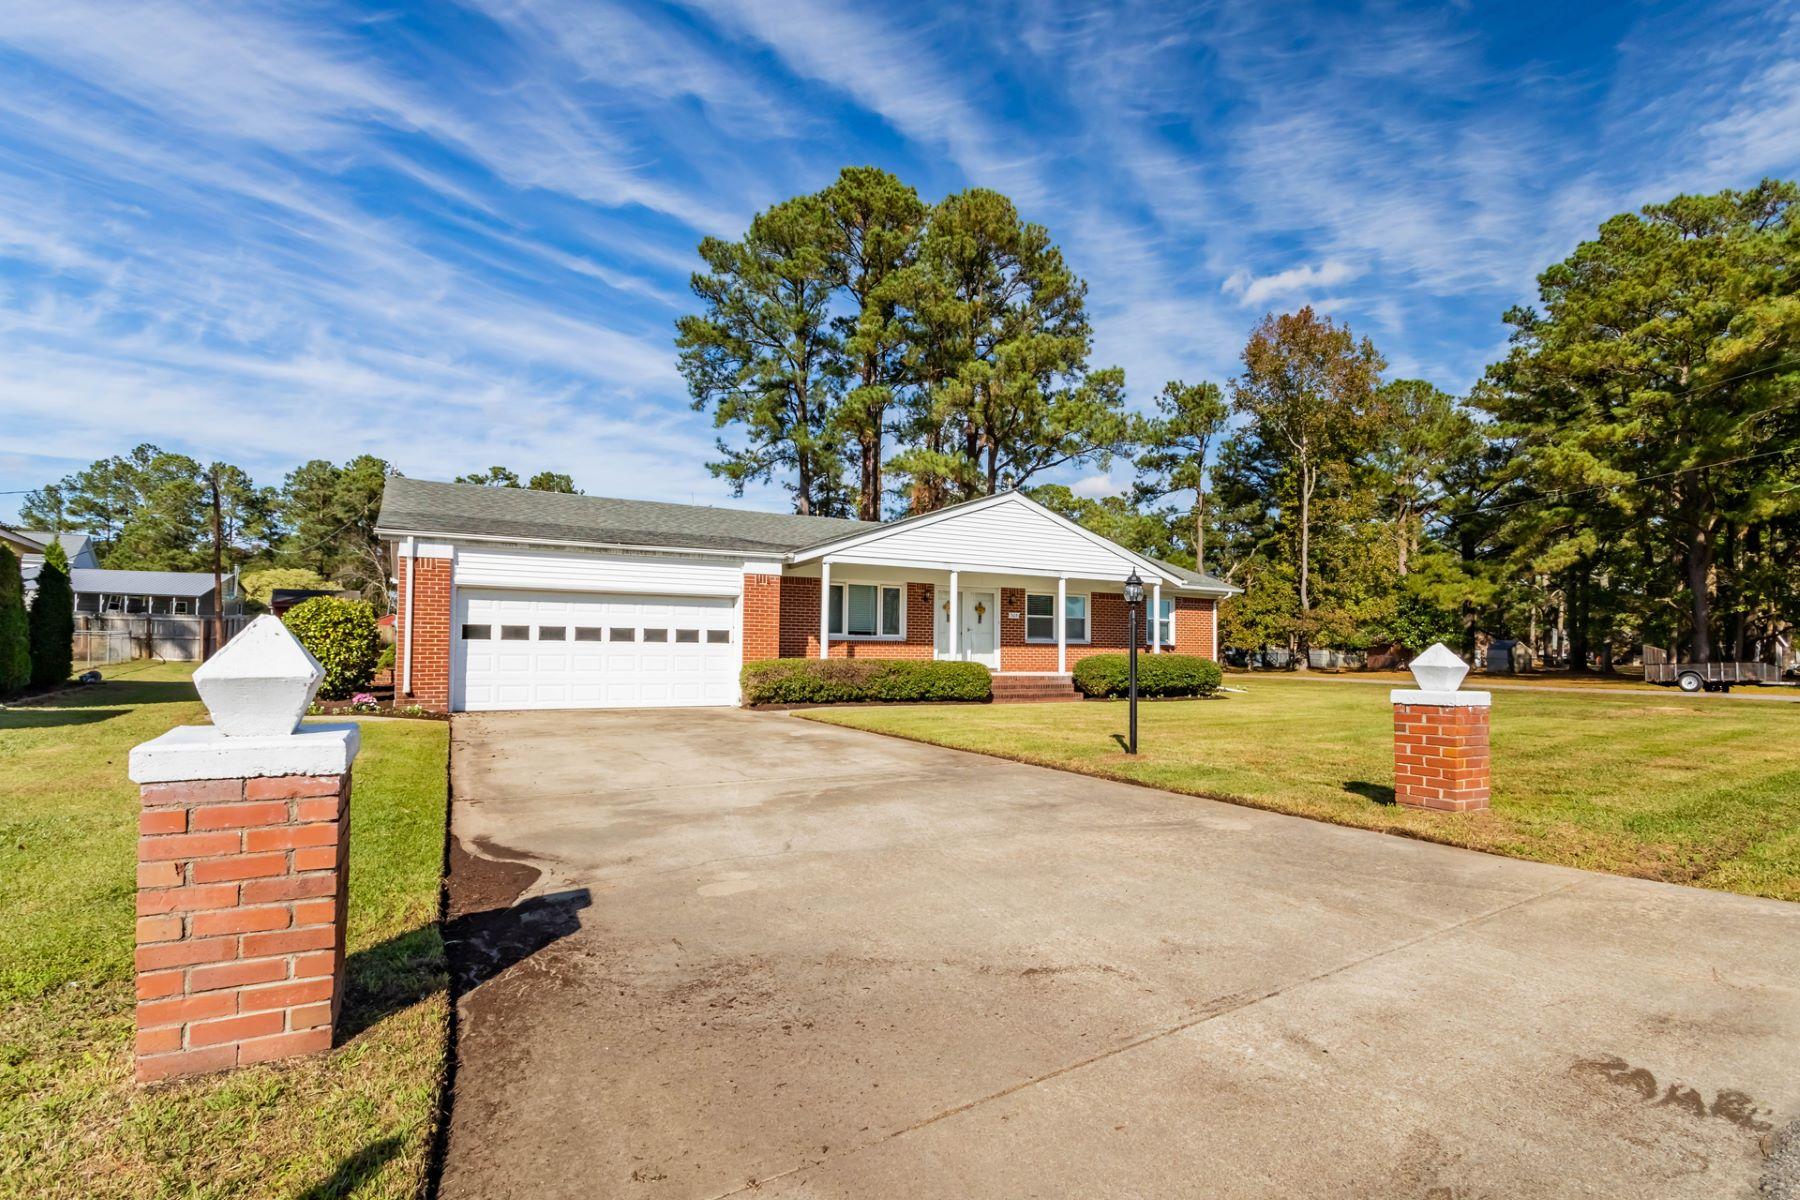 Single Family Homes for Active at Whitehall Shores 305 Magnolia Drive Camden, North Carolina 27921 United States